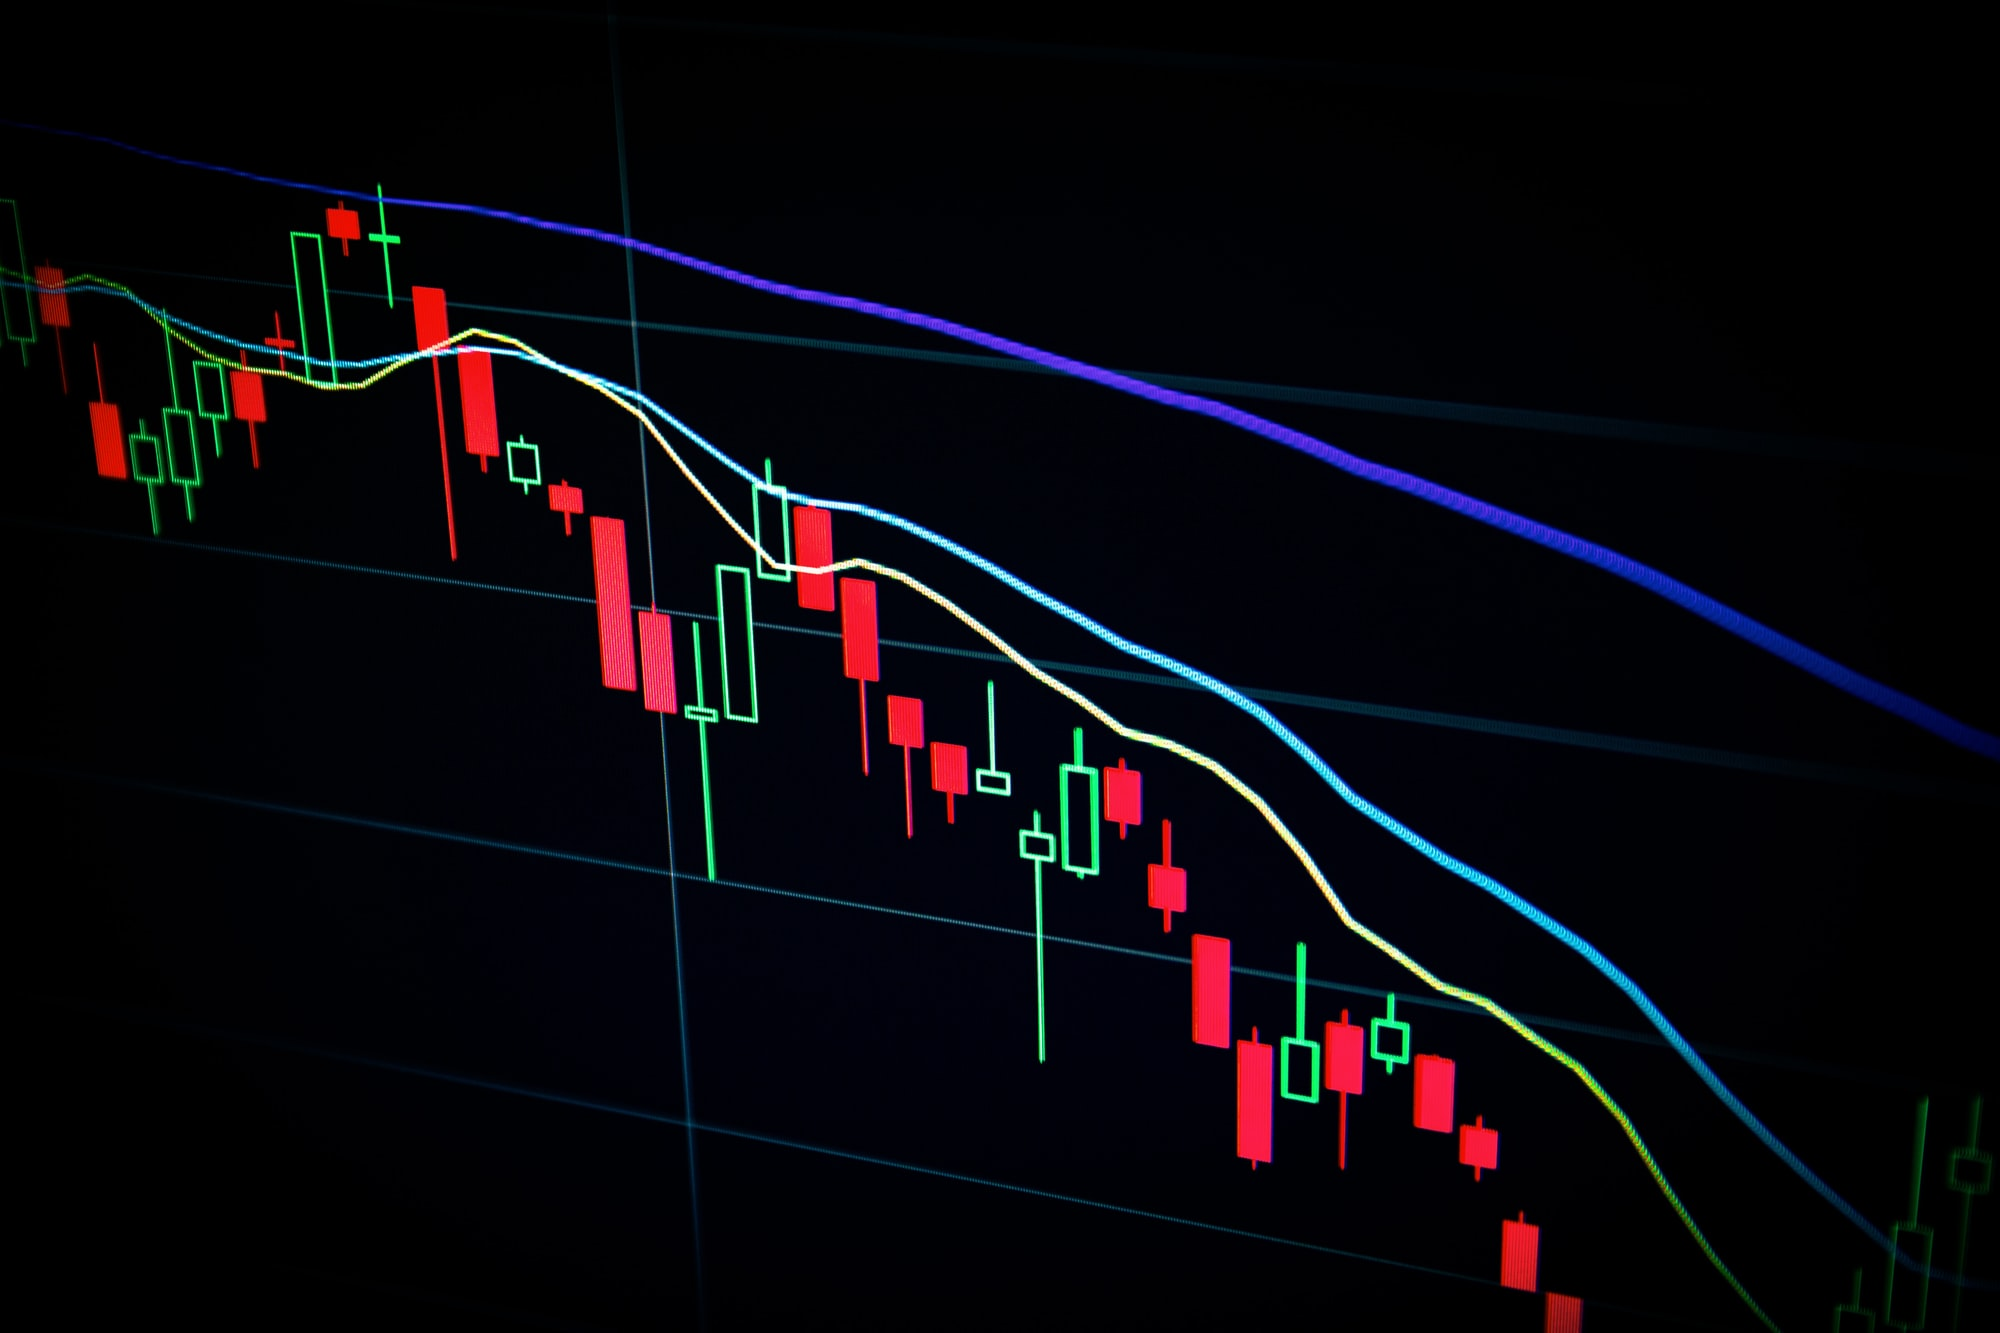 Banks Shorting Stocks